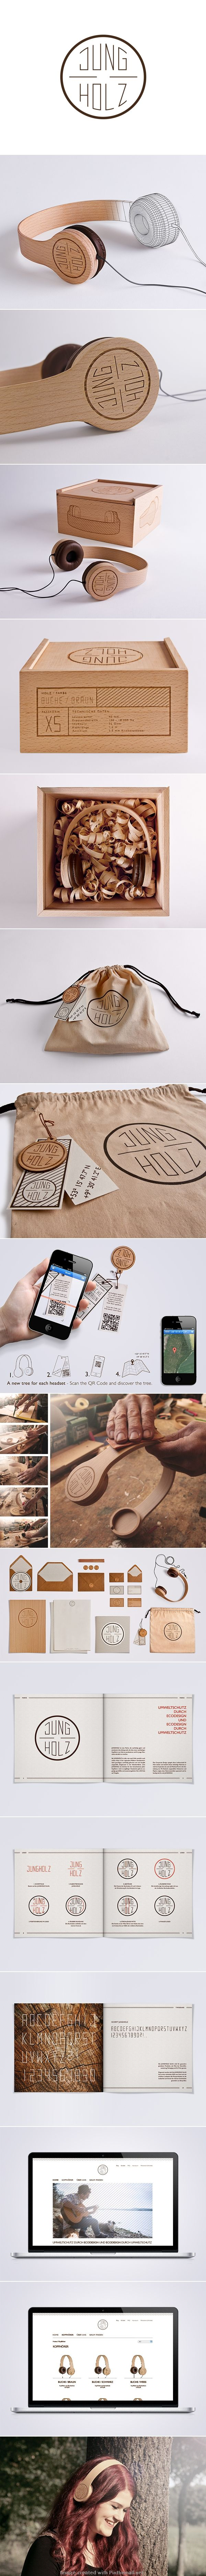 JUNGHOLZ Kopfhörer | Nice wood based #packaging and #identity design of Kristina Düver | Ivan Giorgetti > Behance